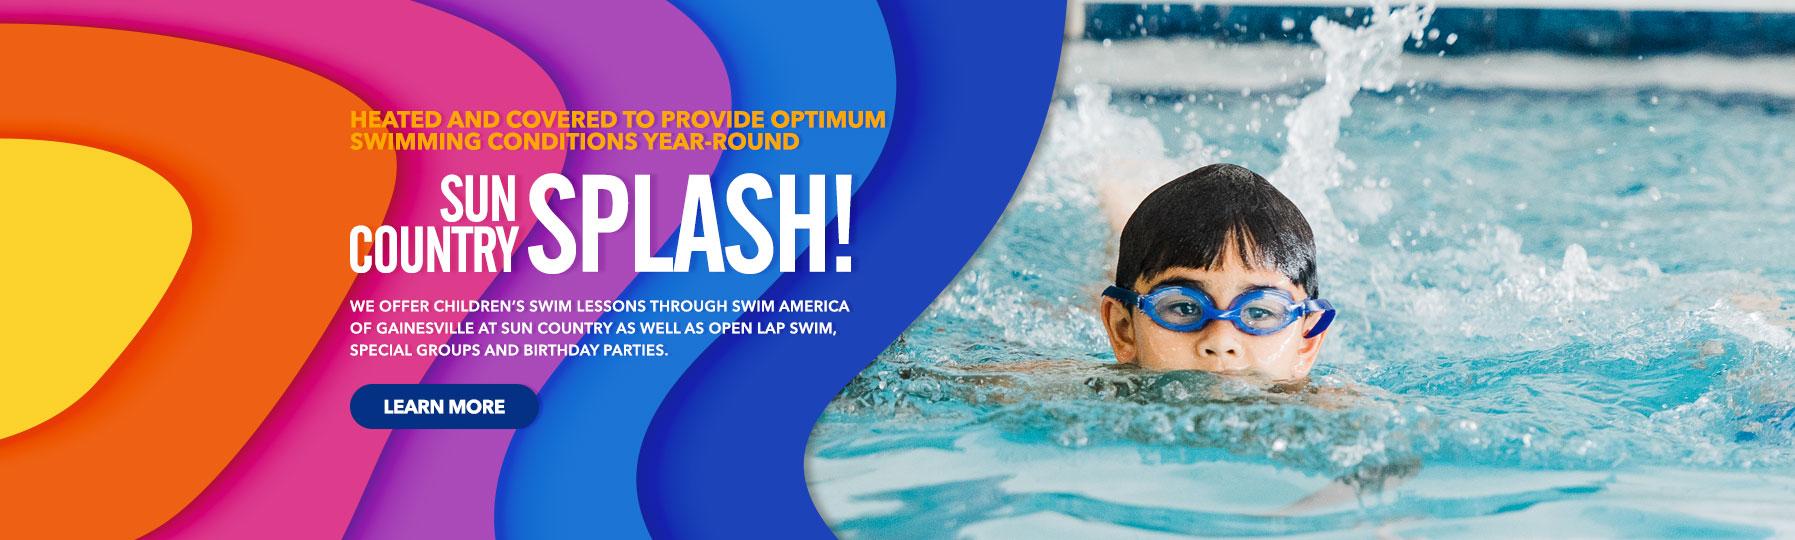 splash-main-scw-0221